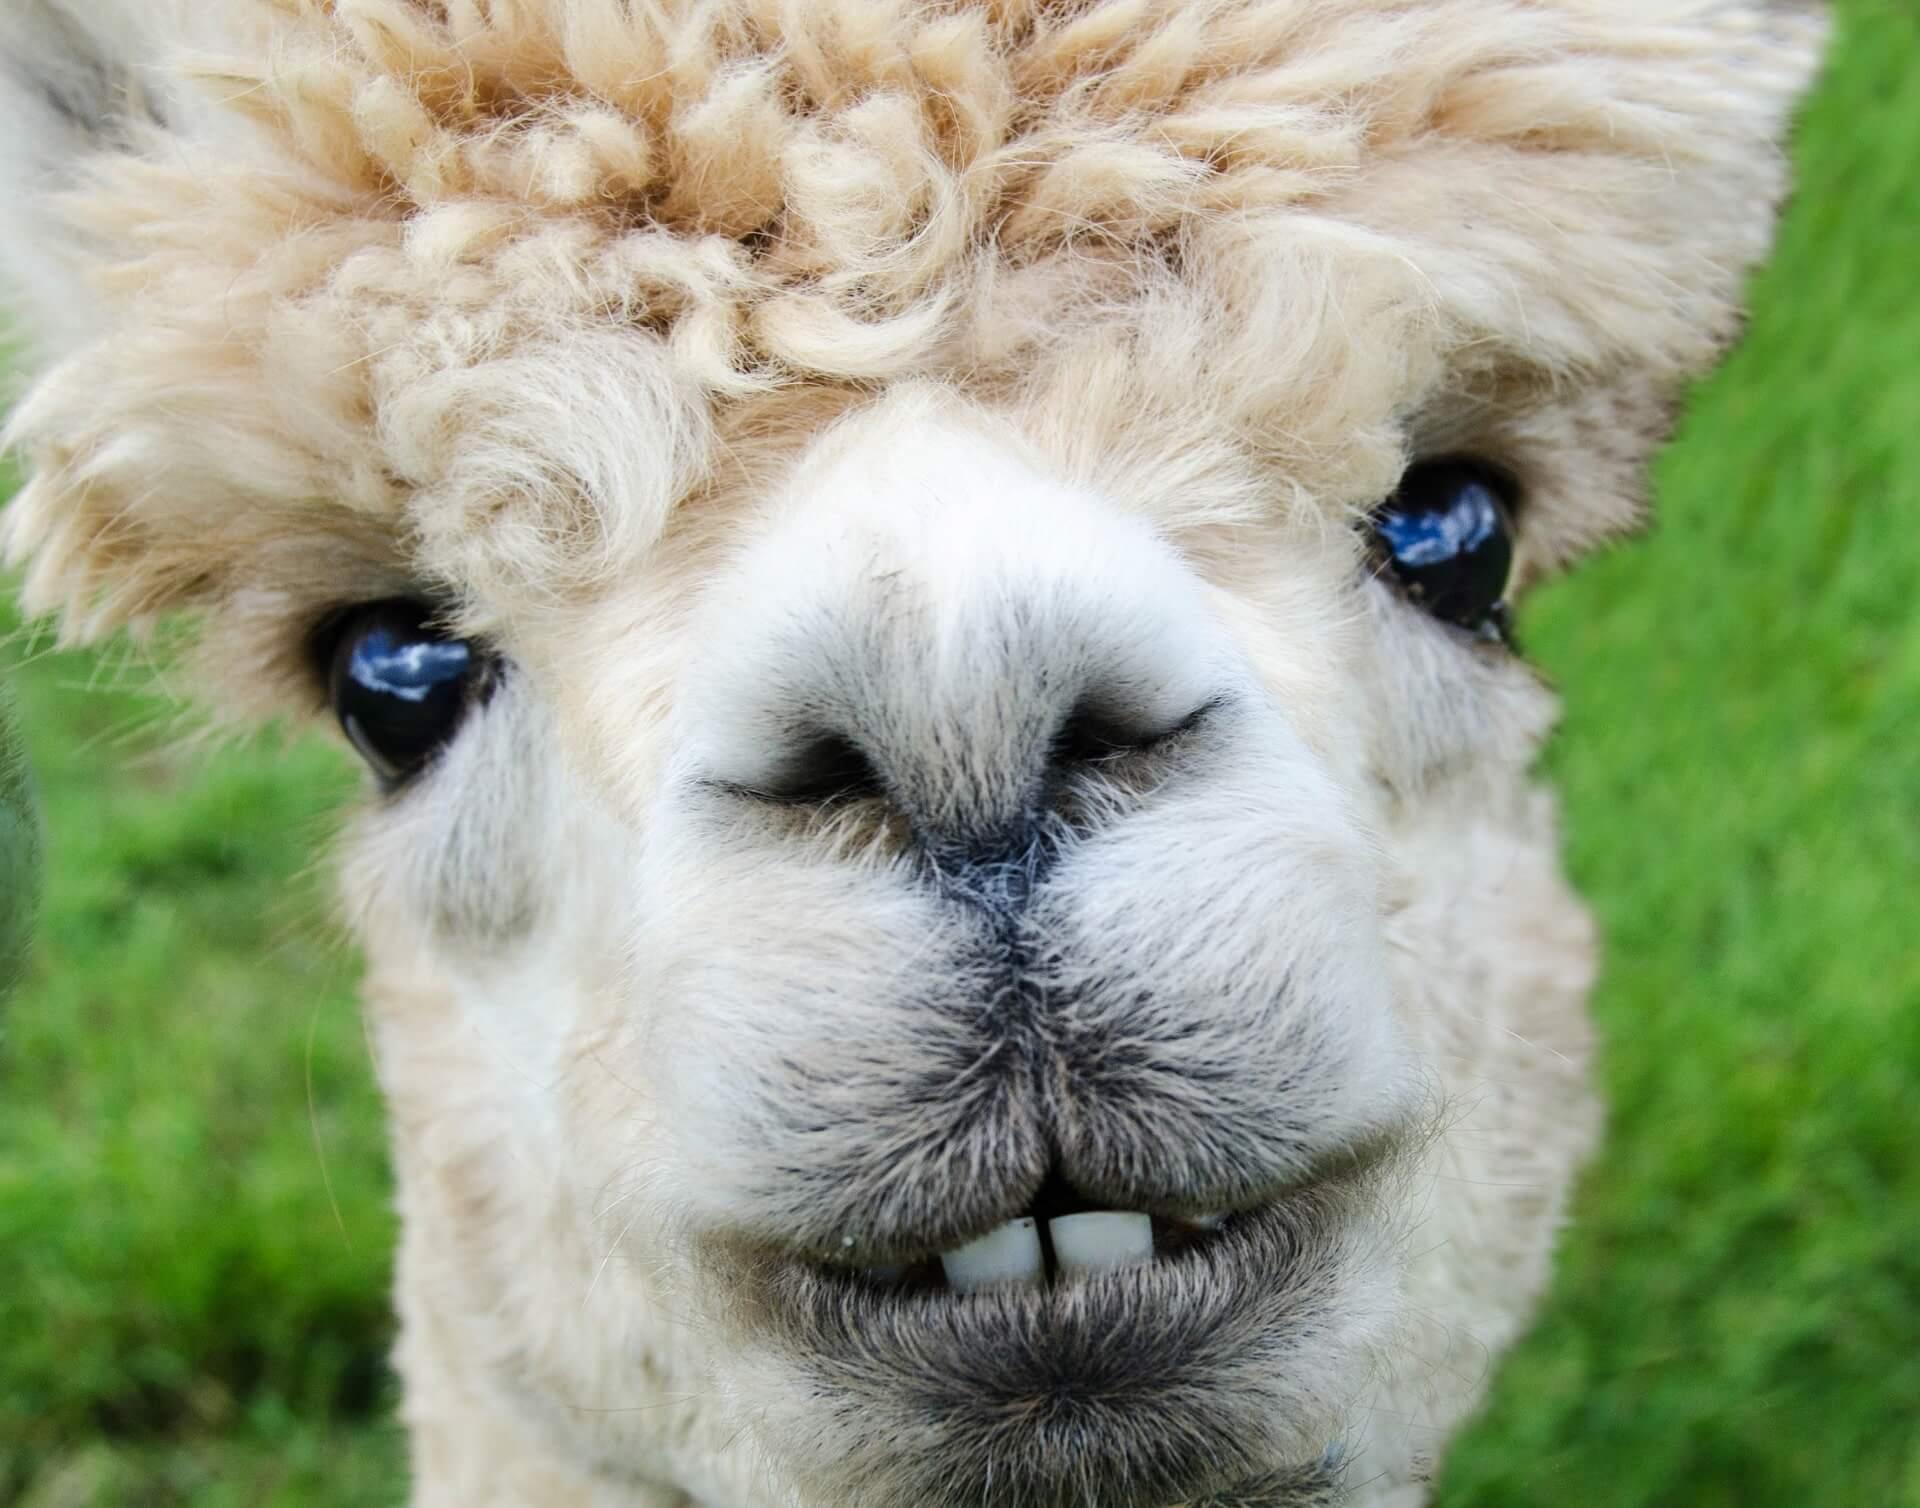 alpaca-985158_1920